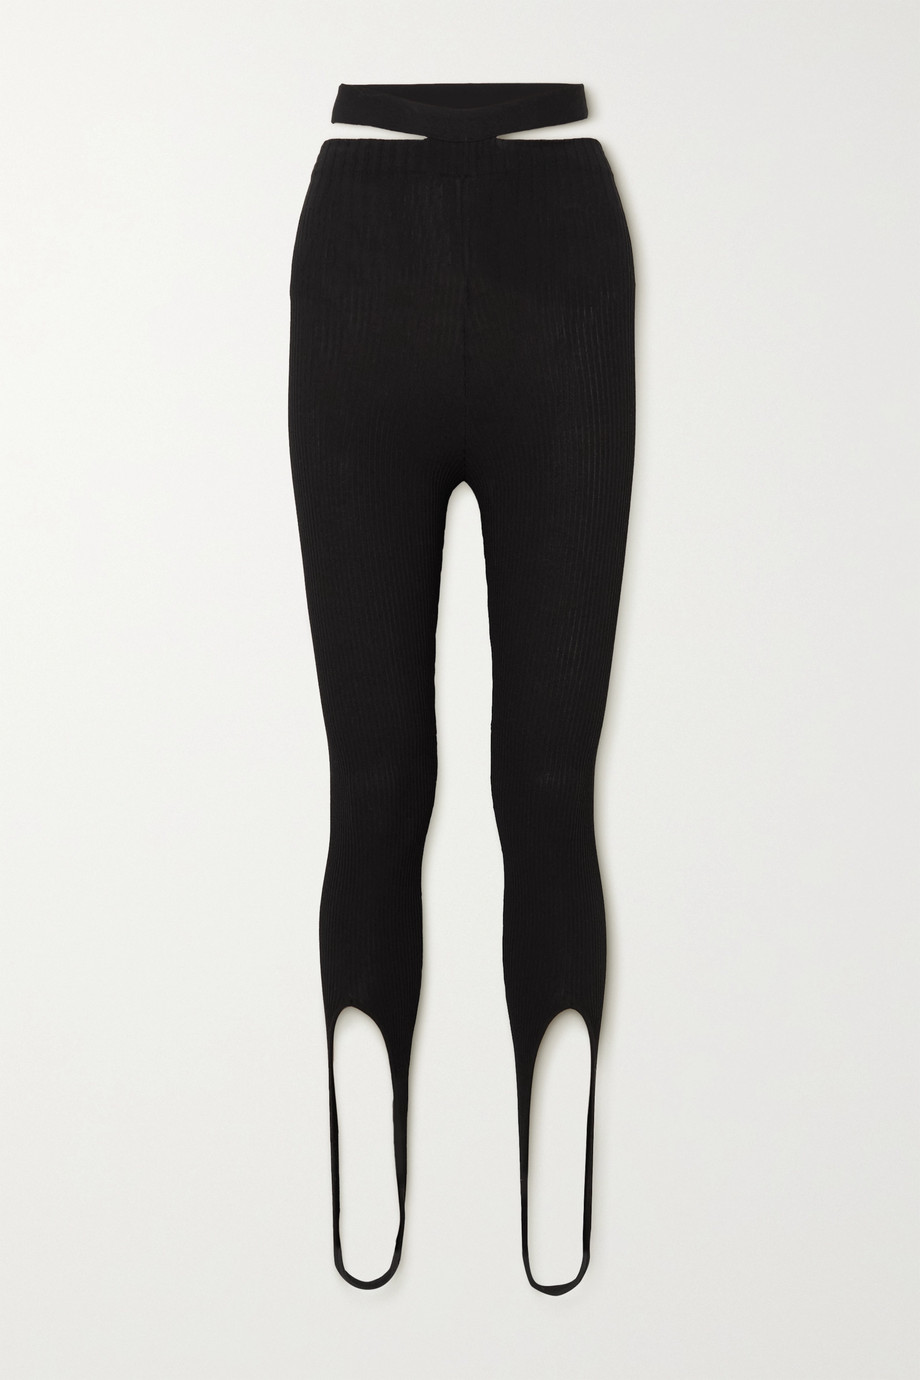 Andrea Adamo Cutout ribbed-knit stirrup leggings